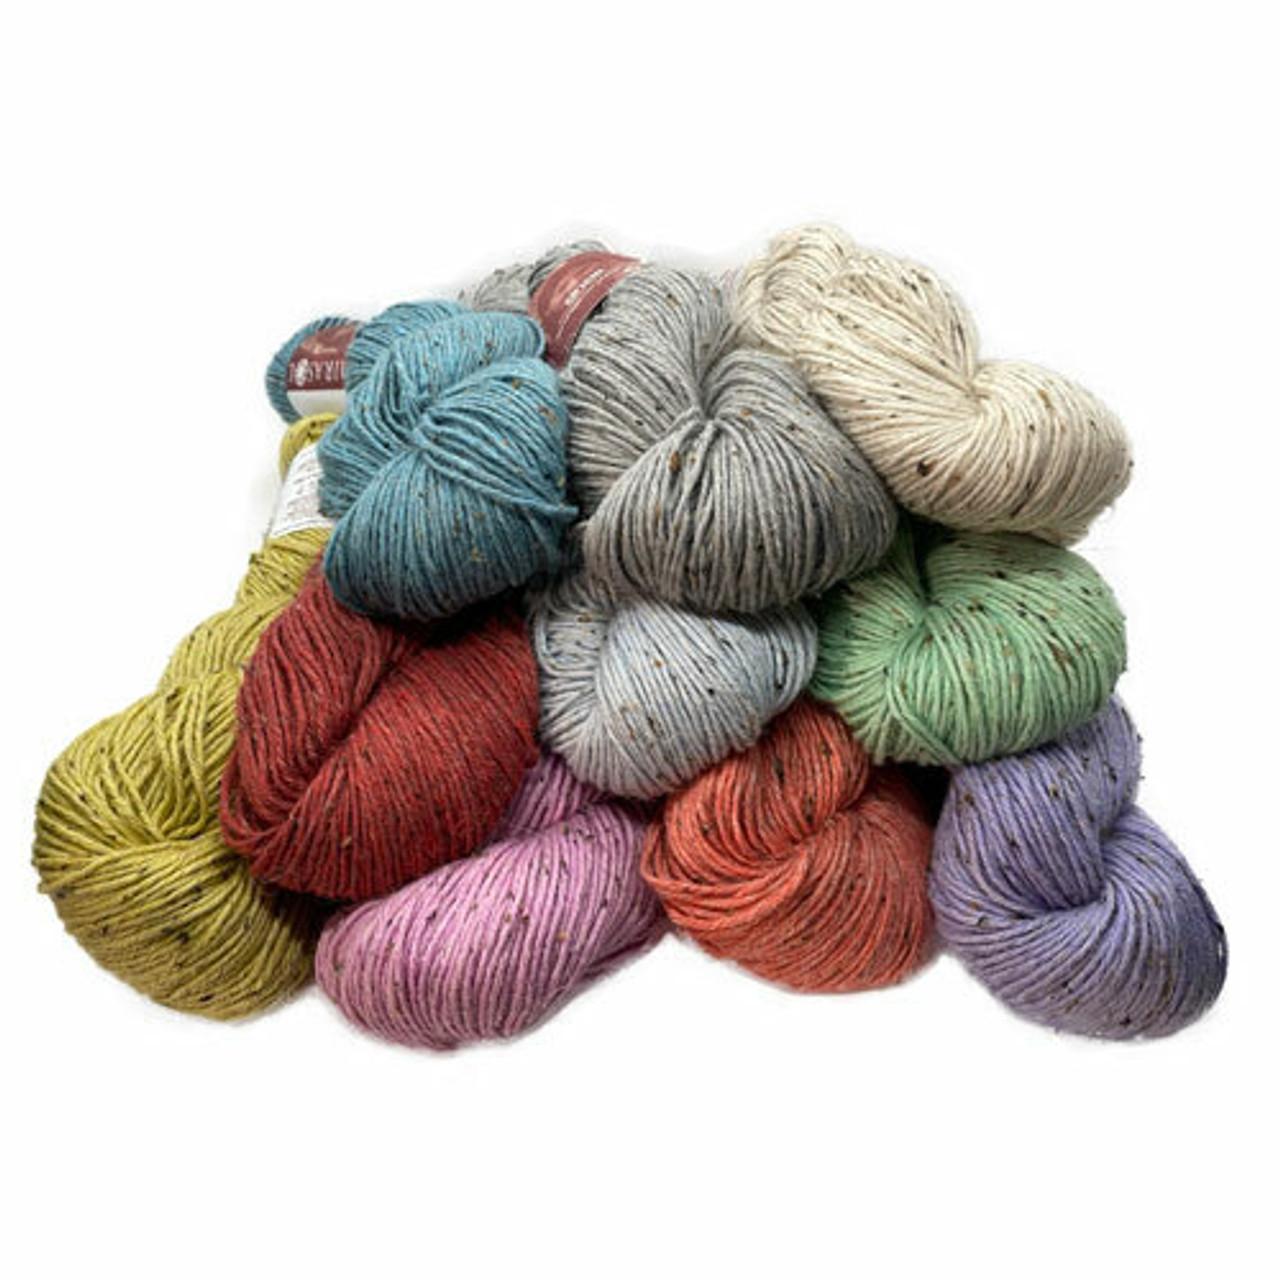 Mirasol Yarns - Ch'ichi - Alpaca, Linen, Bamboo Blend